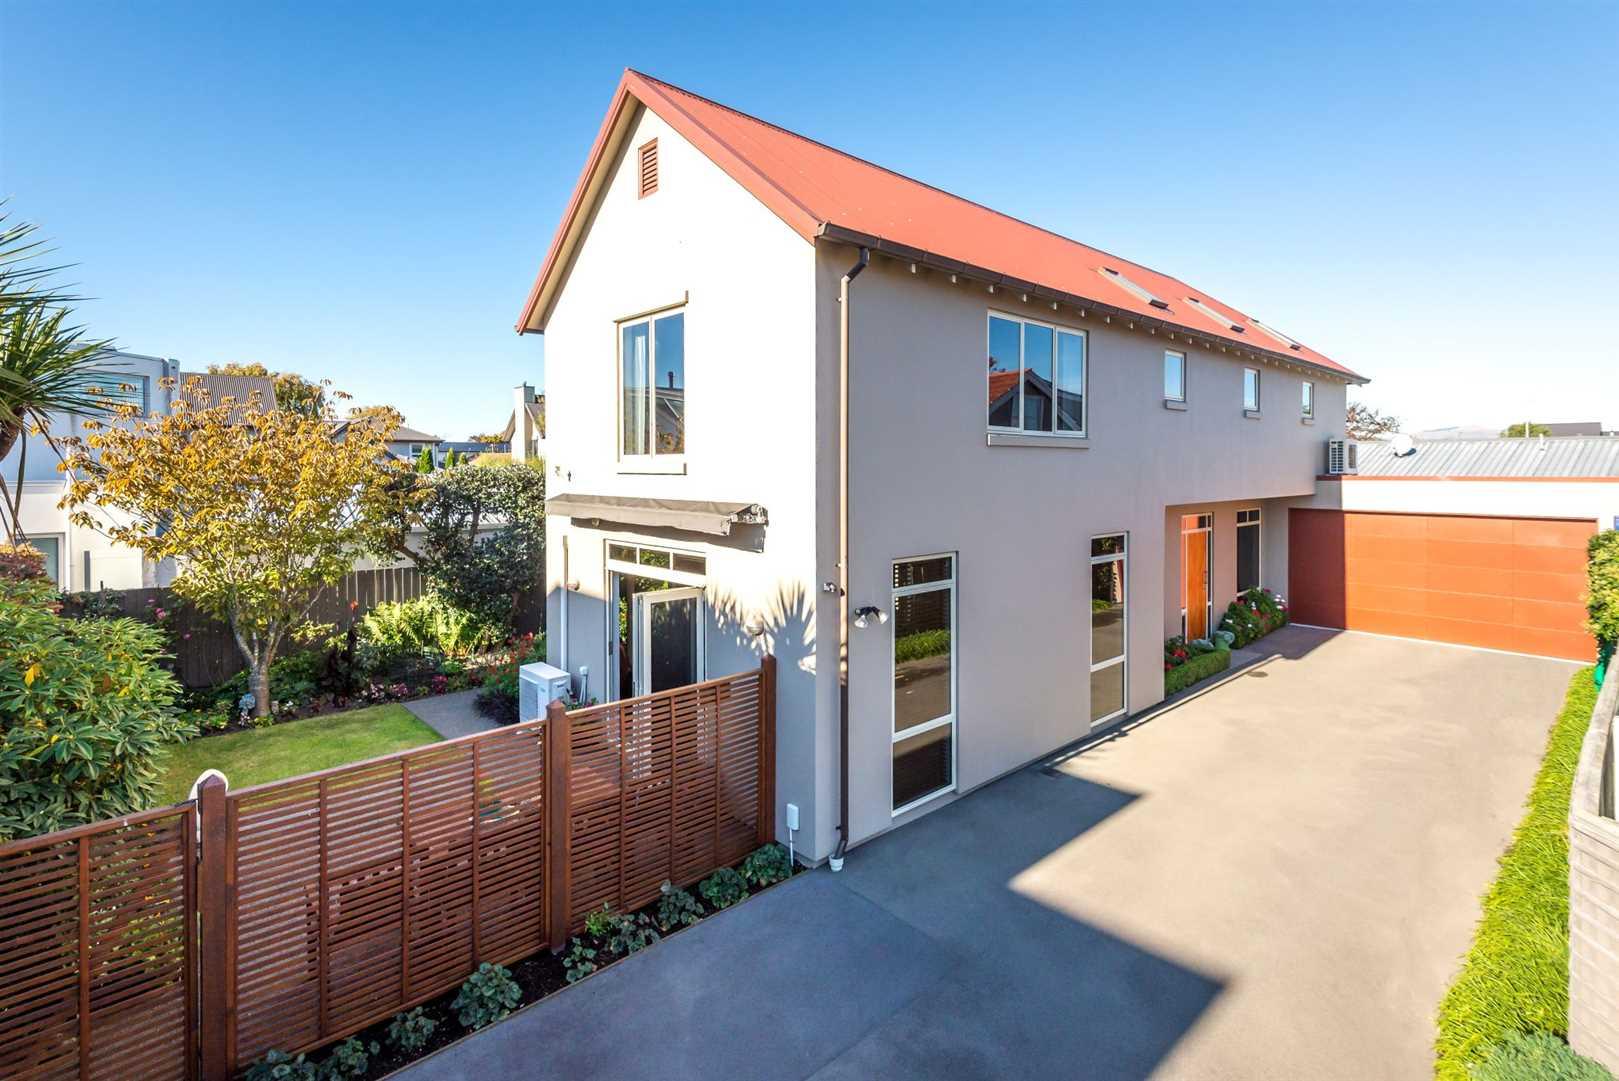 22D Browns Road, Merivale - Christchurch City